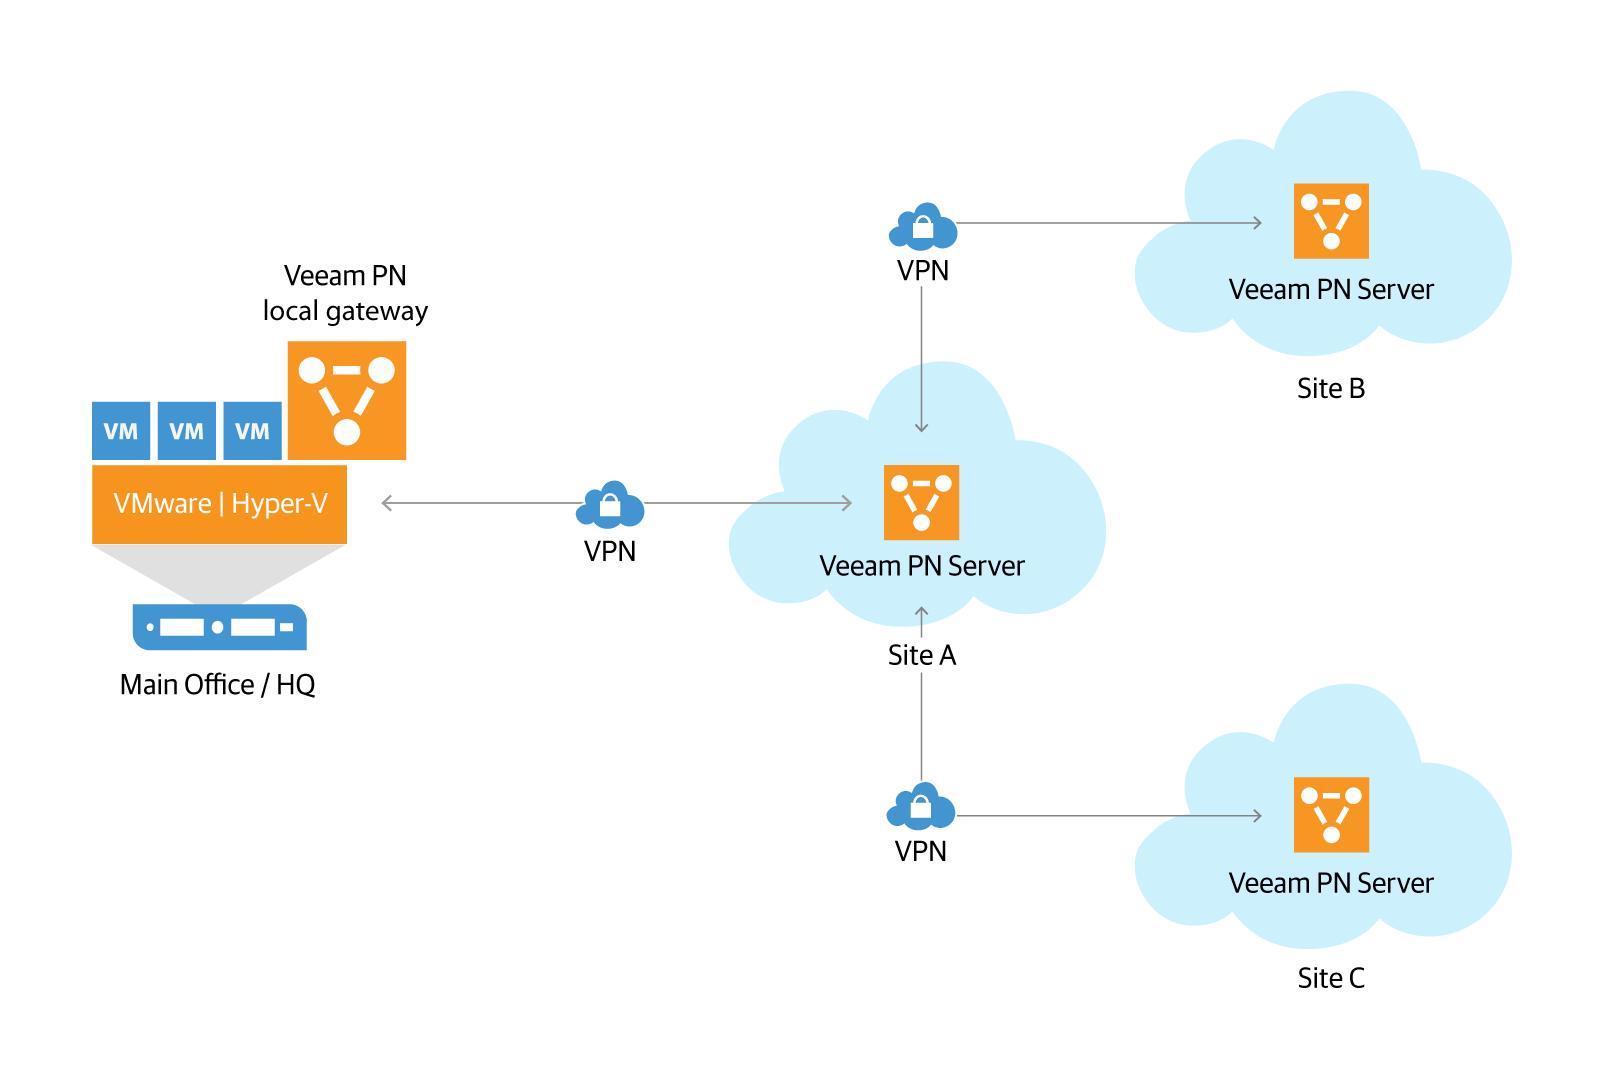 veeam pn cloud to cloud png [ 1280 x 861 Pixel ]